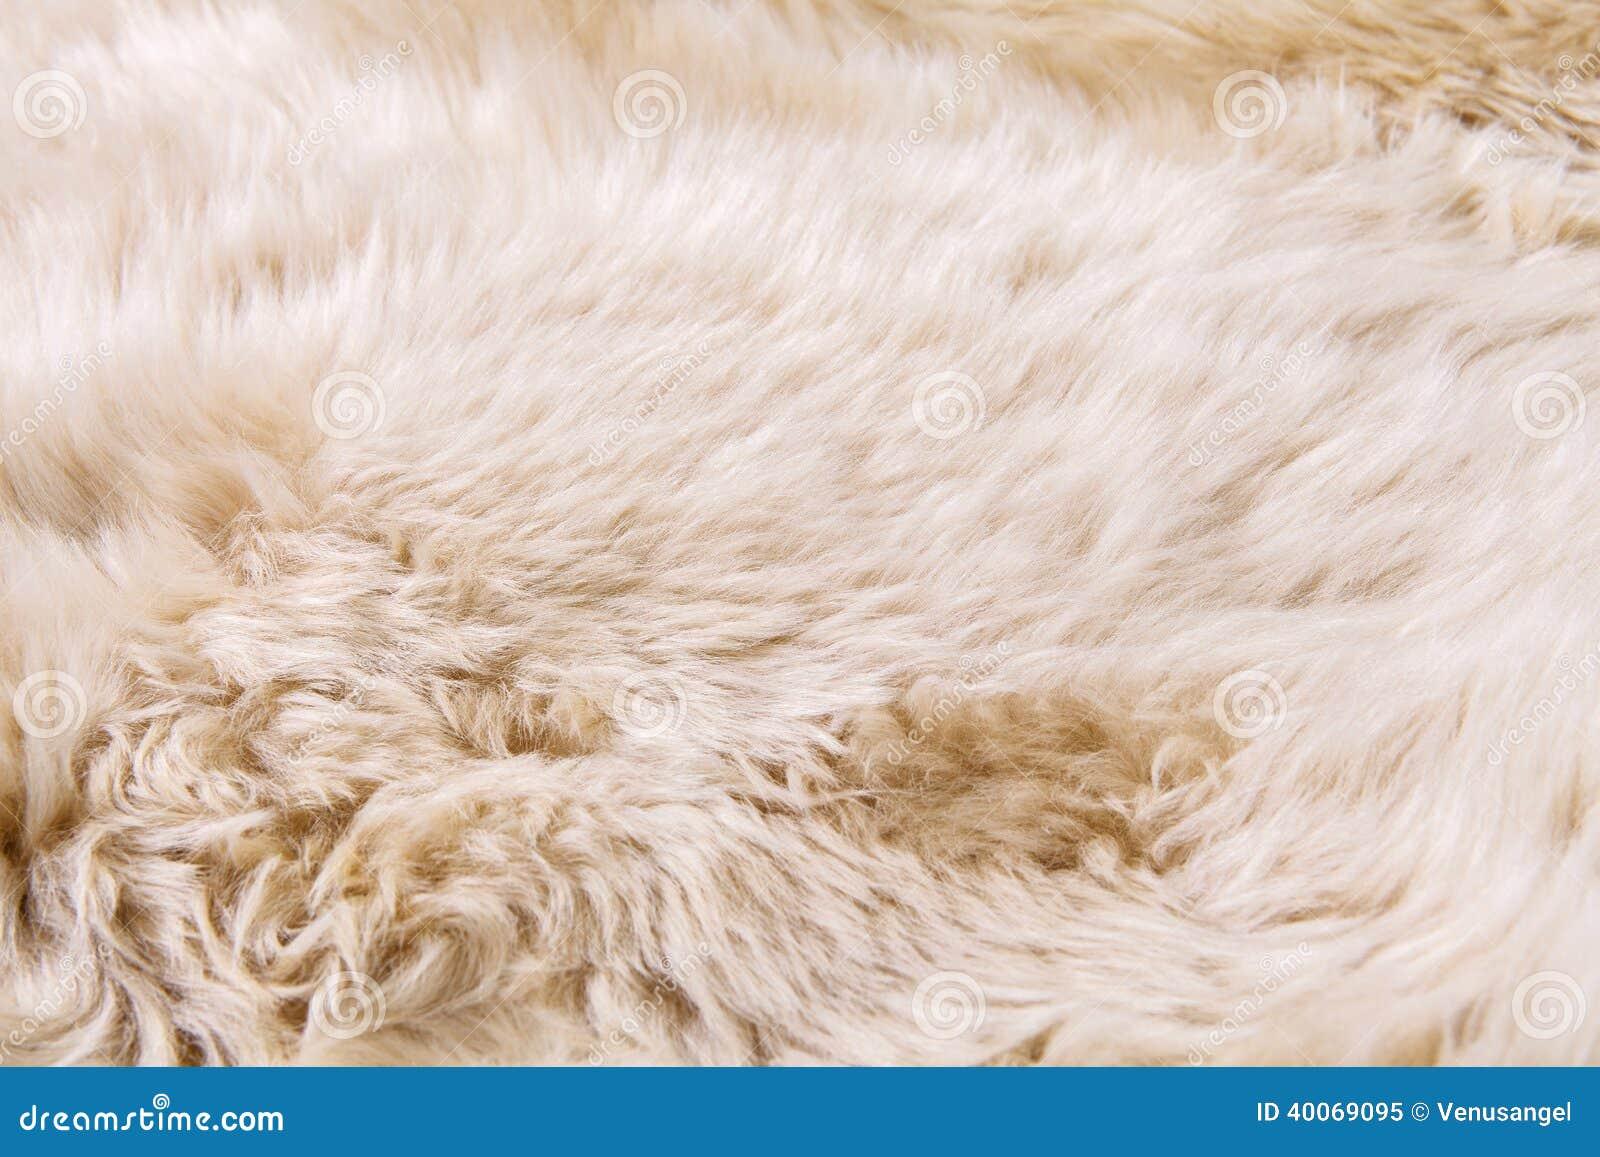 close up texture of fur carpet stock image image 40069095